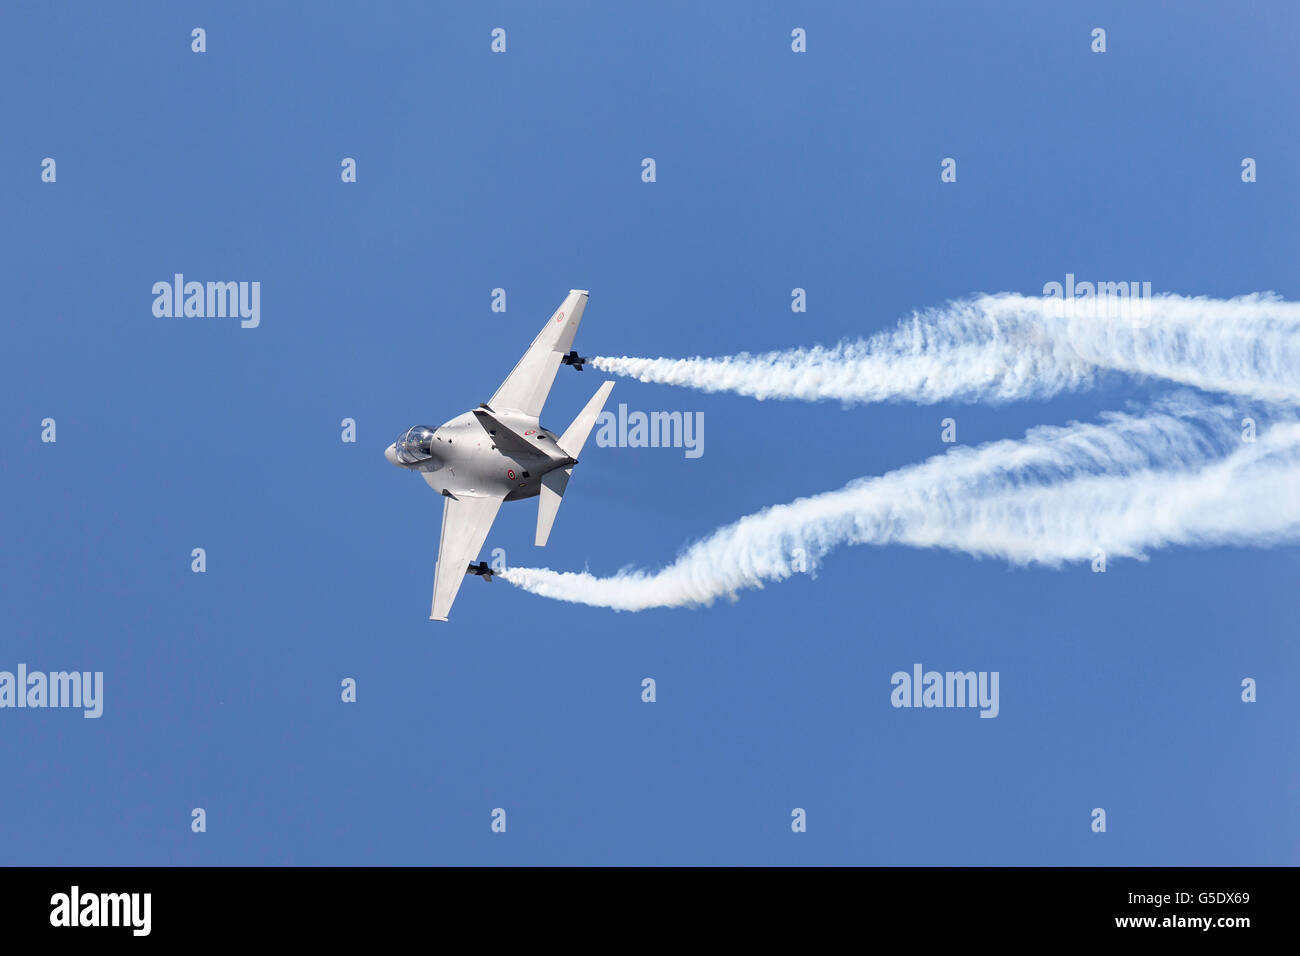 Italian Air Force (Aeronautica Militare Italiana) Aermacchi T-346 Jet traning aircraft at the Farnborough International - Stock Image